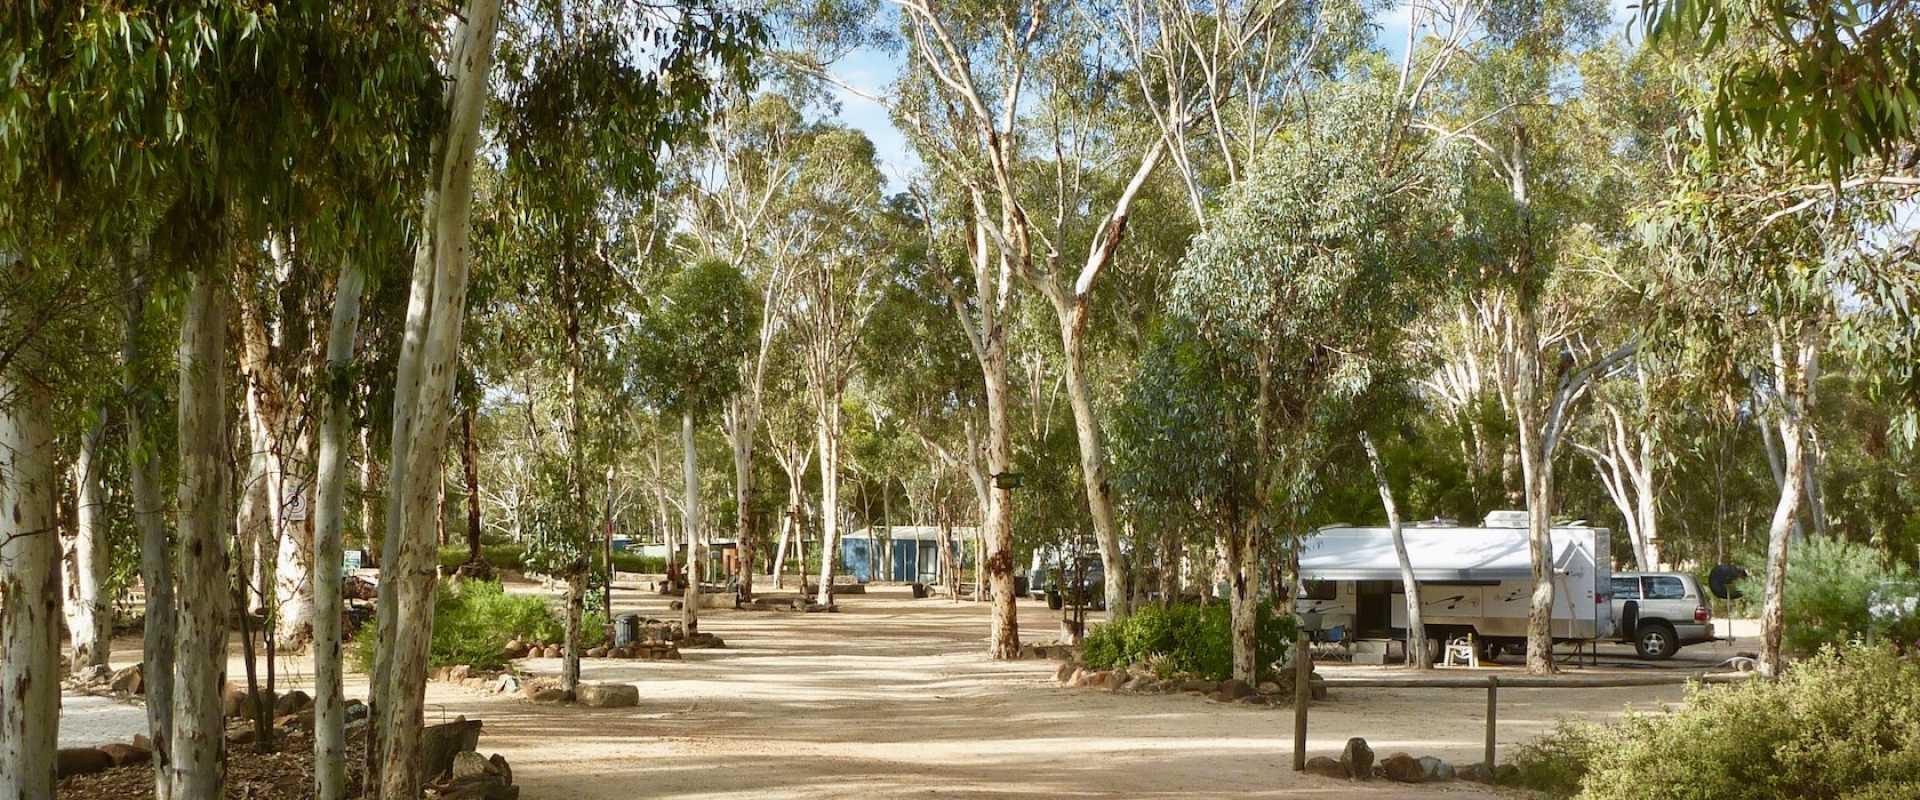 Kui Parks, Toodyay Holiday Park & Chalets, Toodyay WA